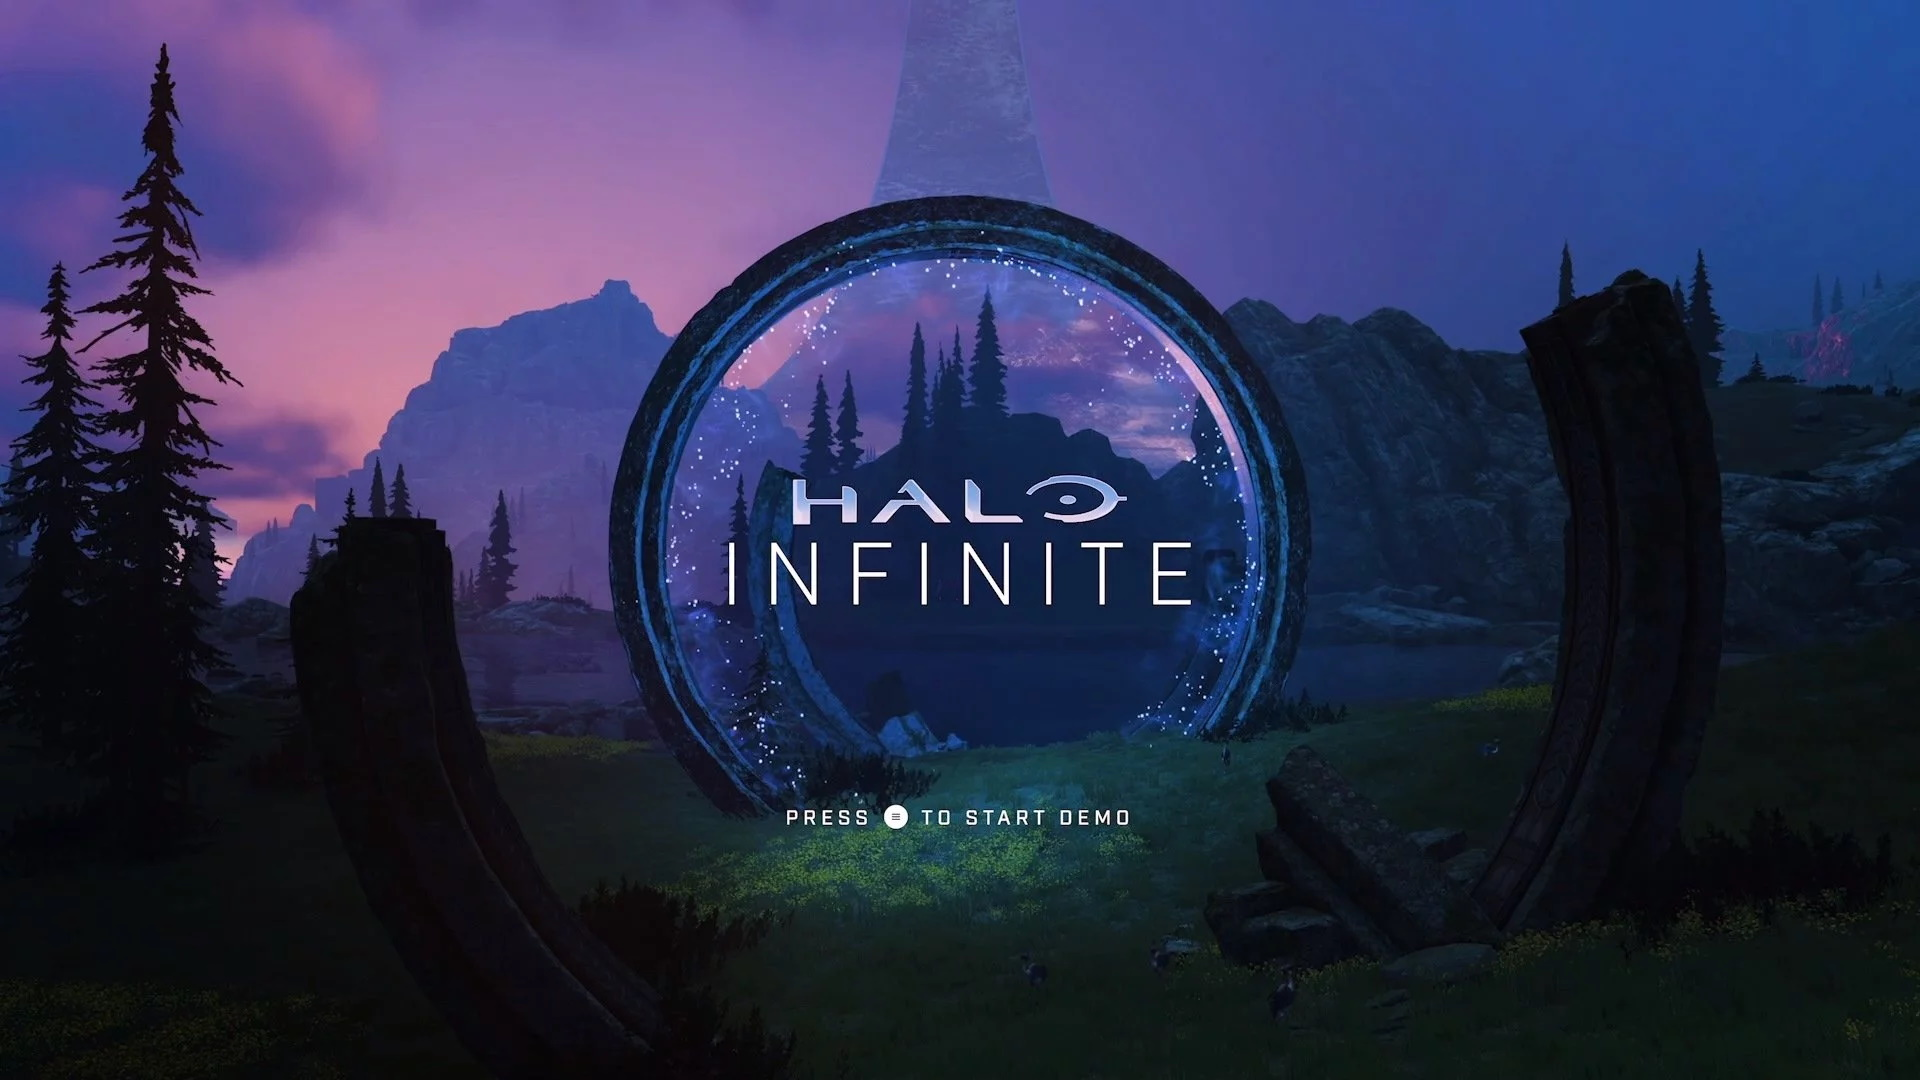 halo-infinite-campaign-gameplay-revealed.jpg